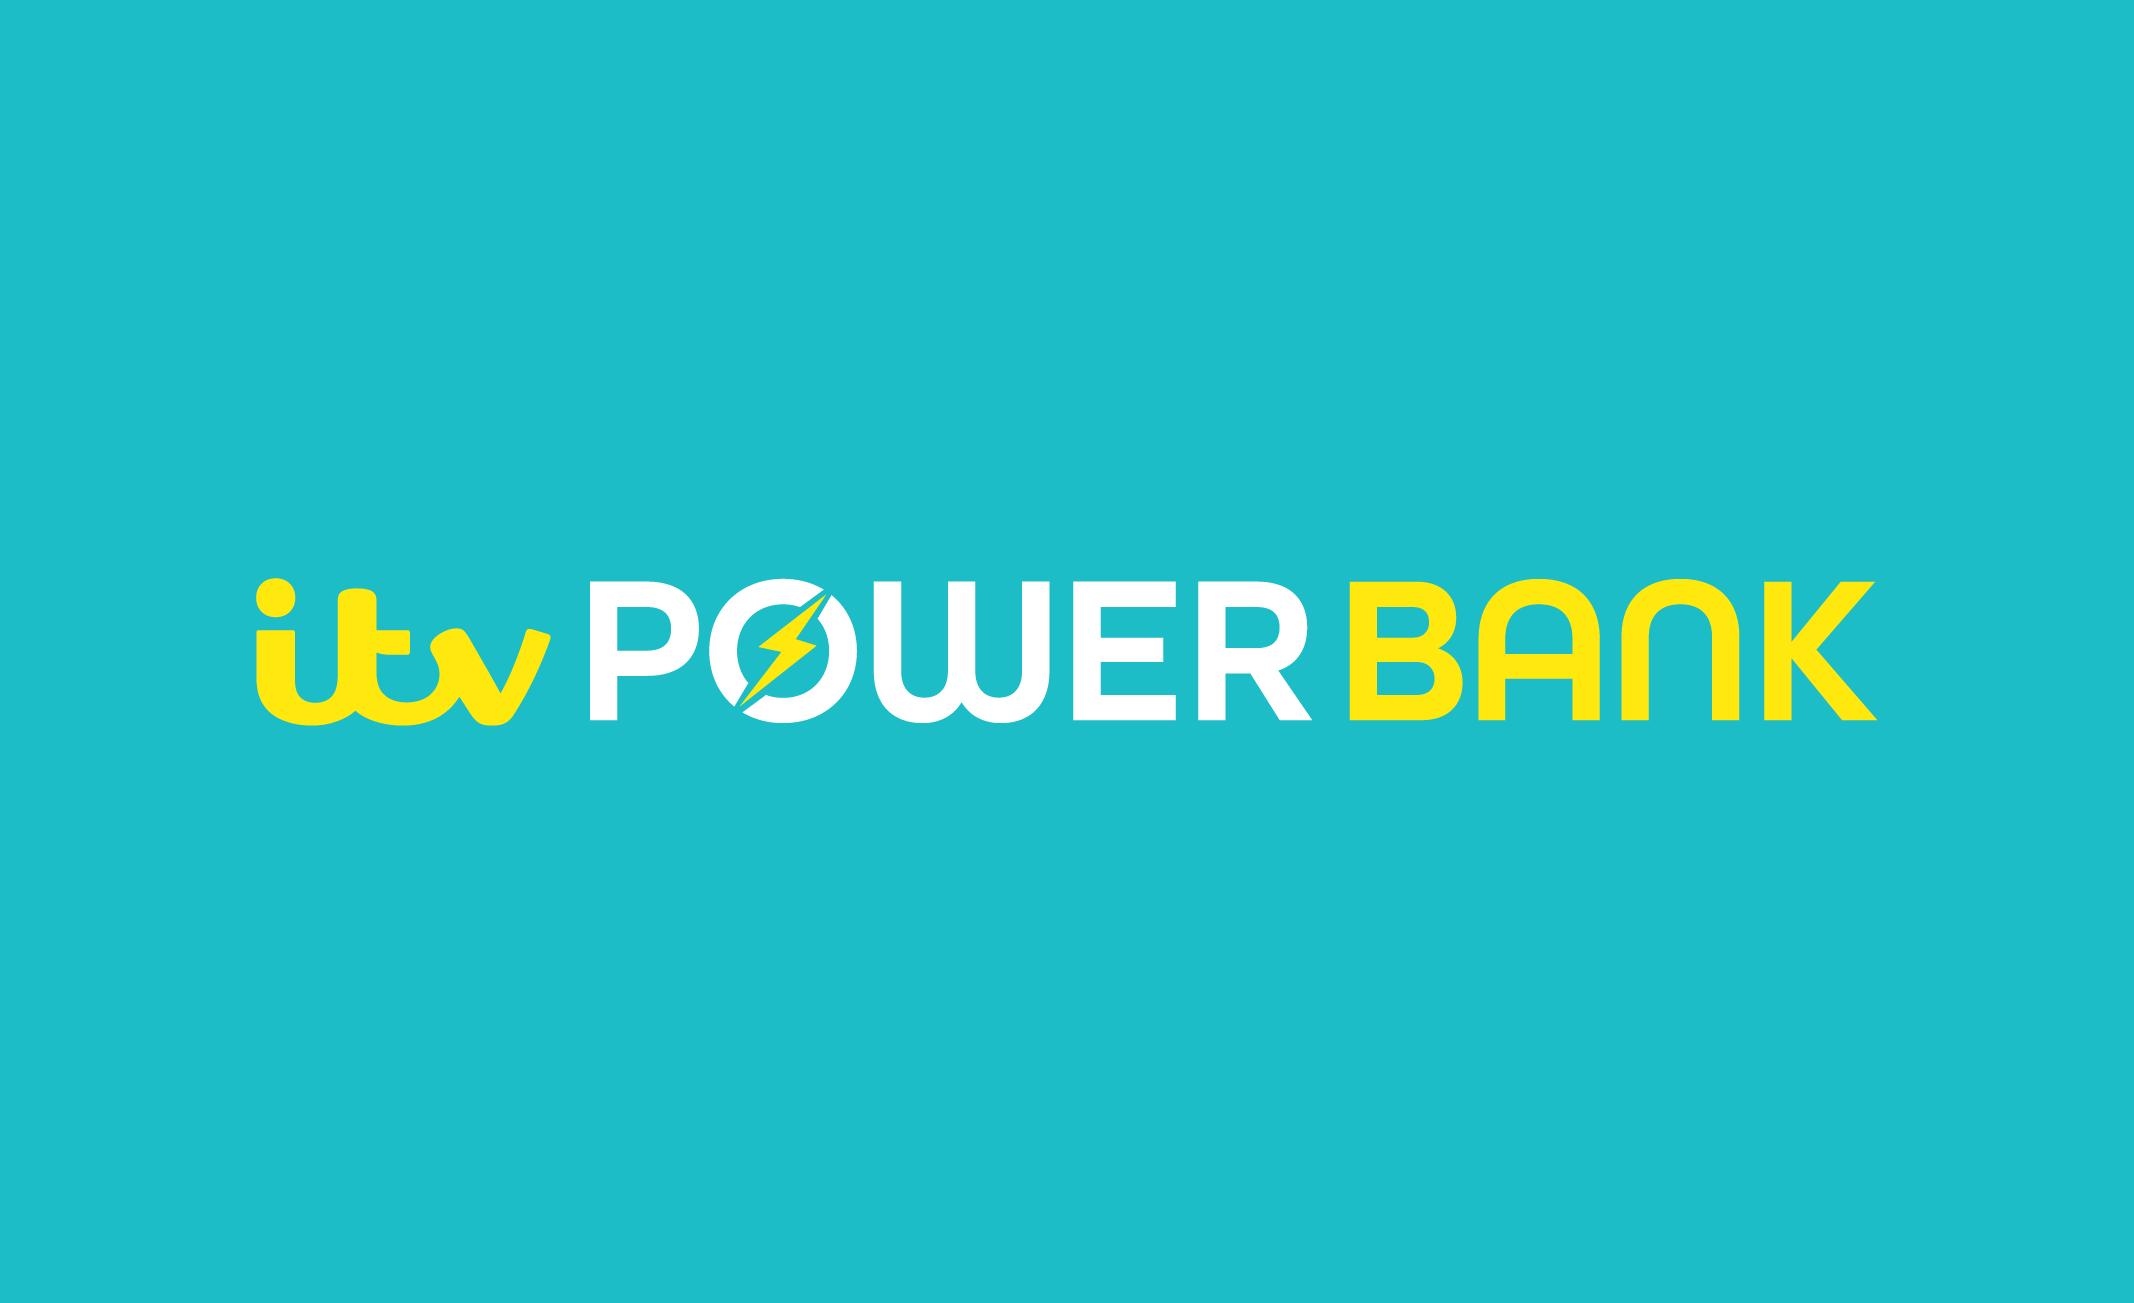 PowerBank-Website-BannerImage.png